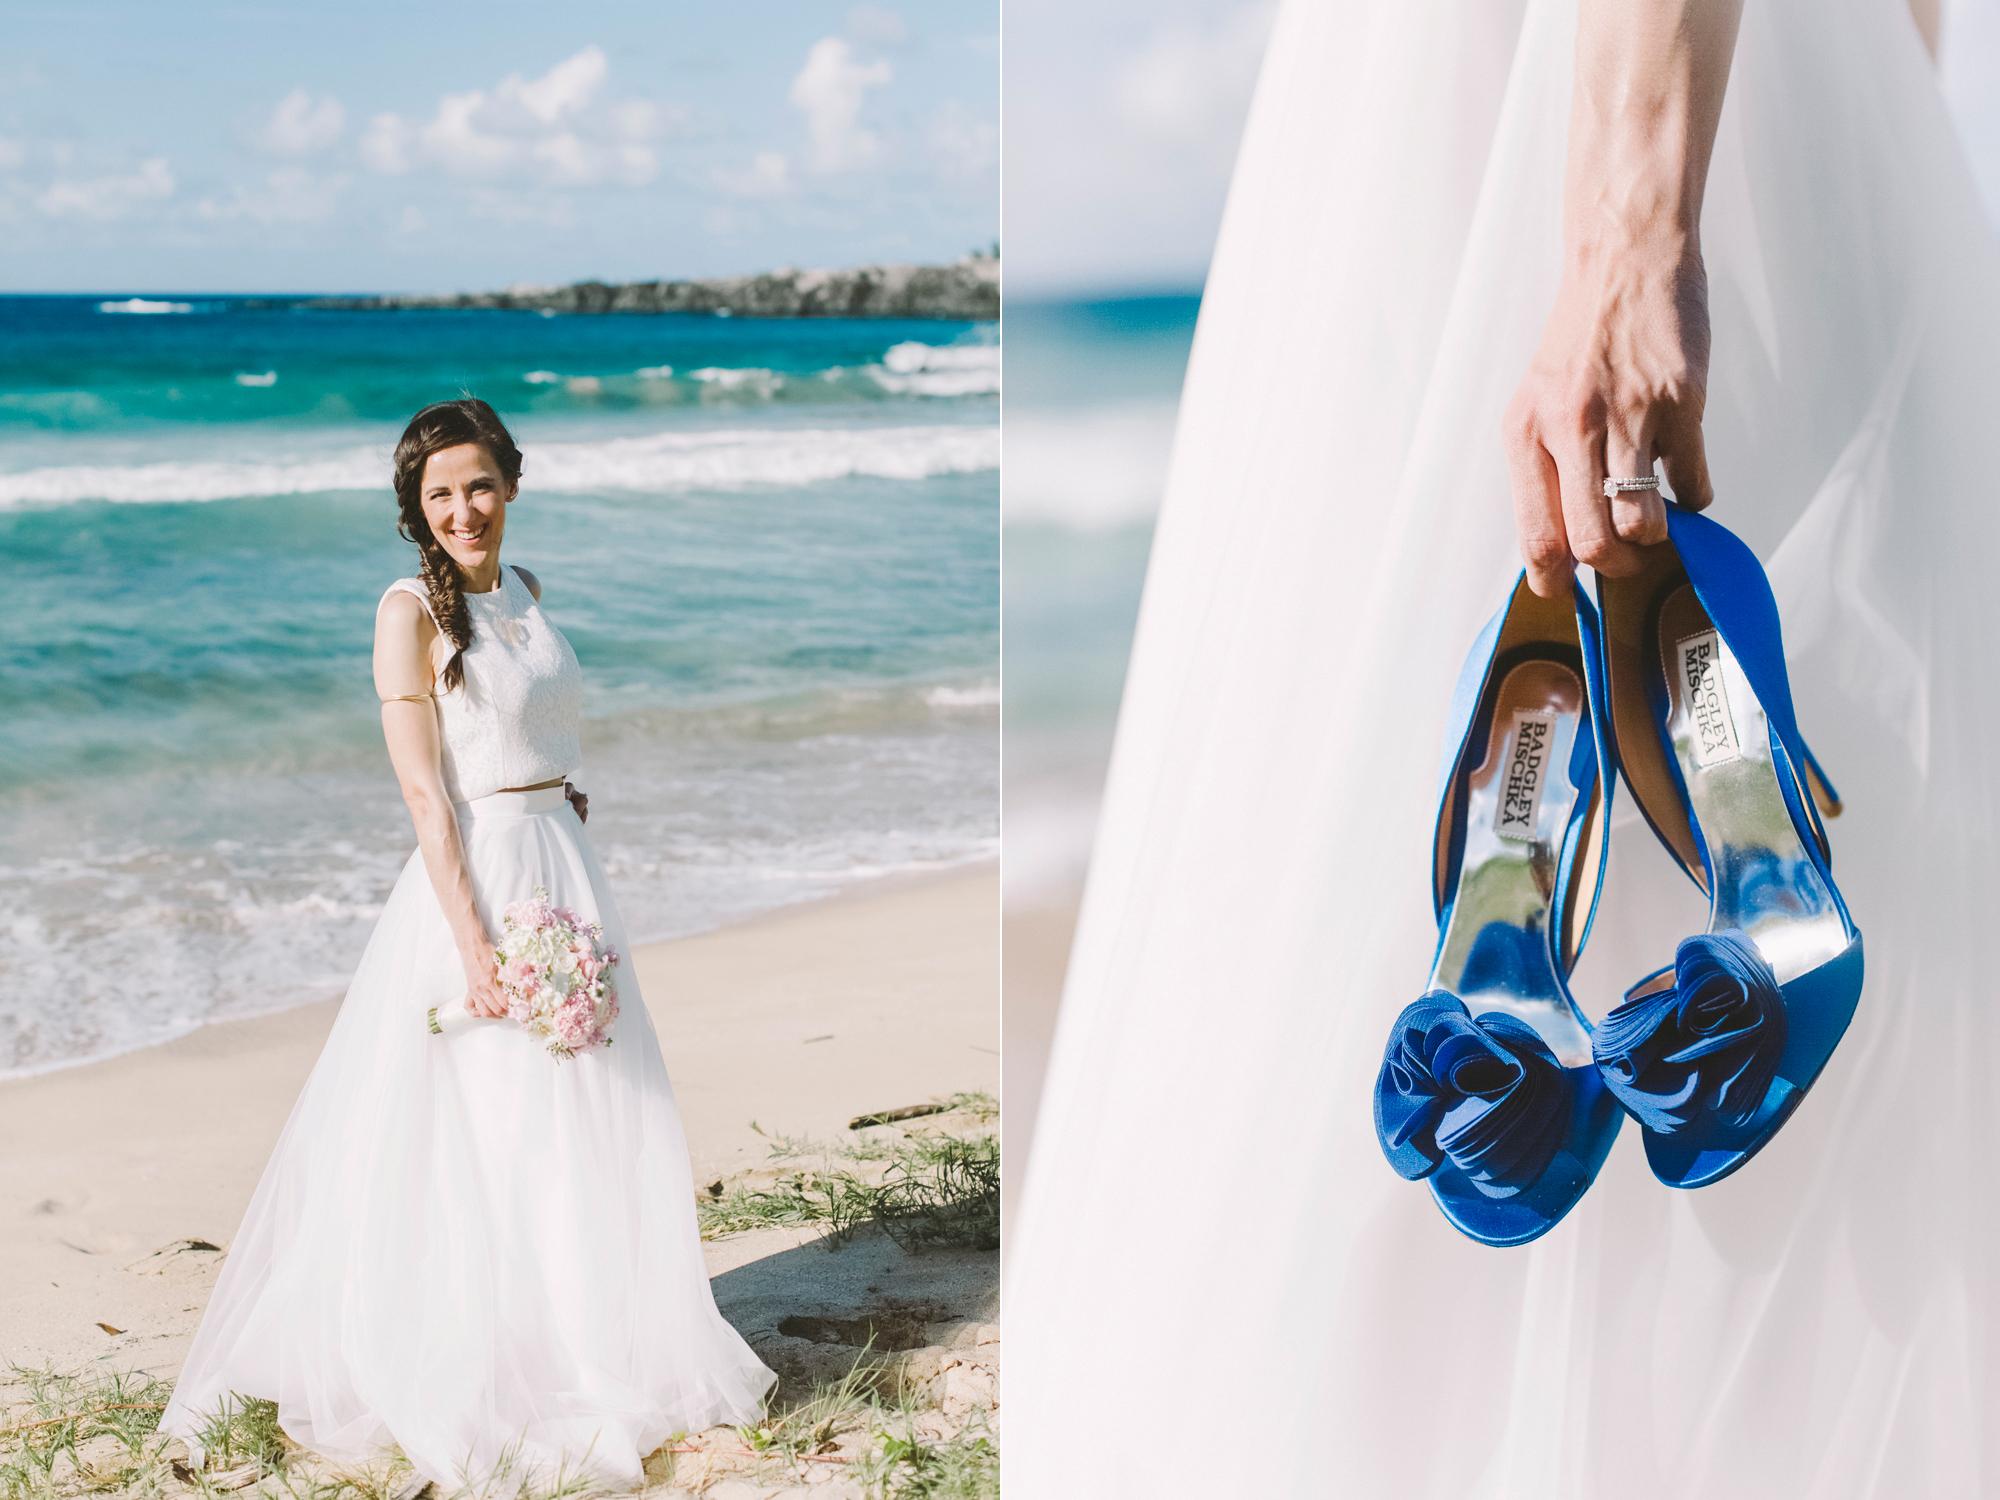 angie-diaz-photography-maui-wedding-ironwoods-beach-35.jpg